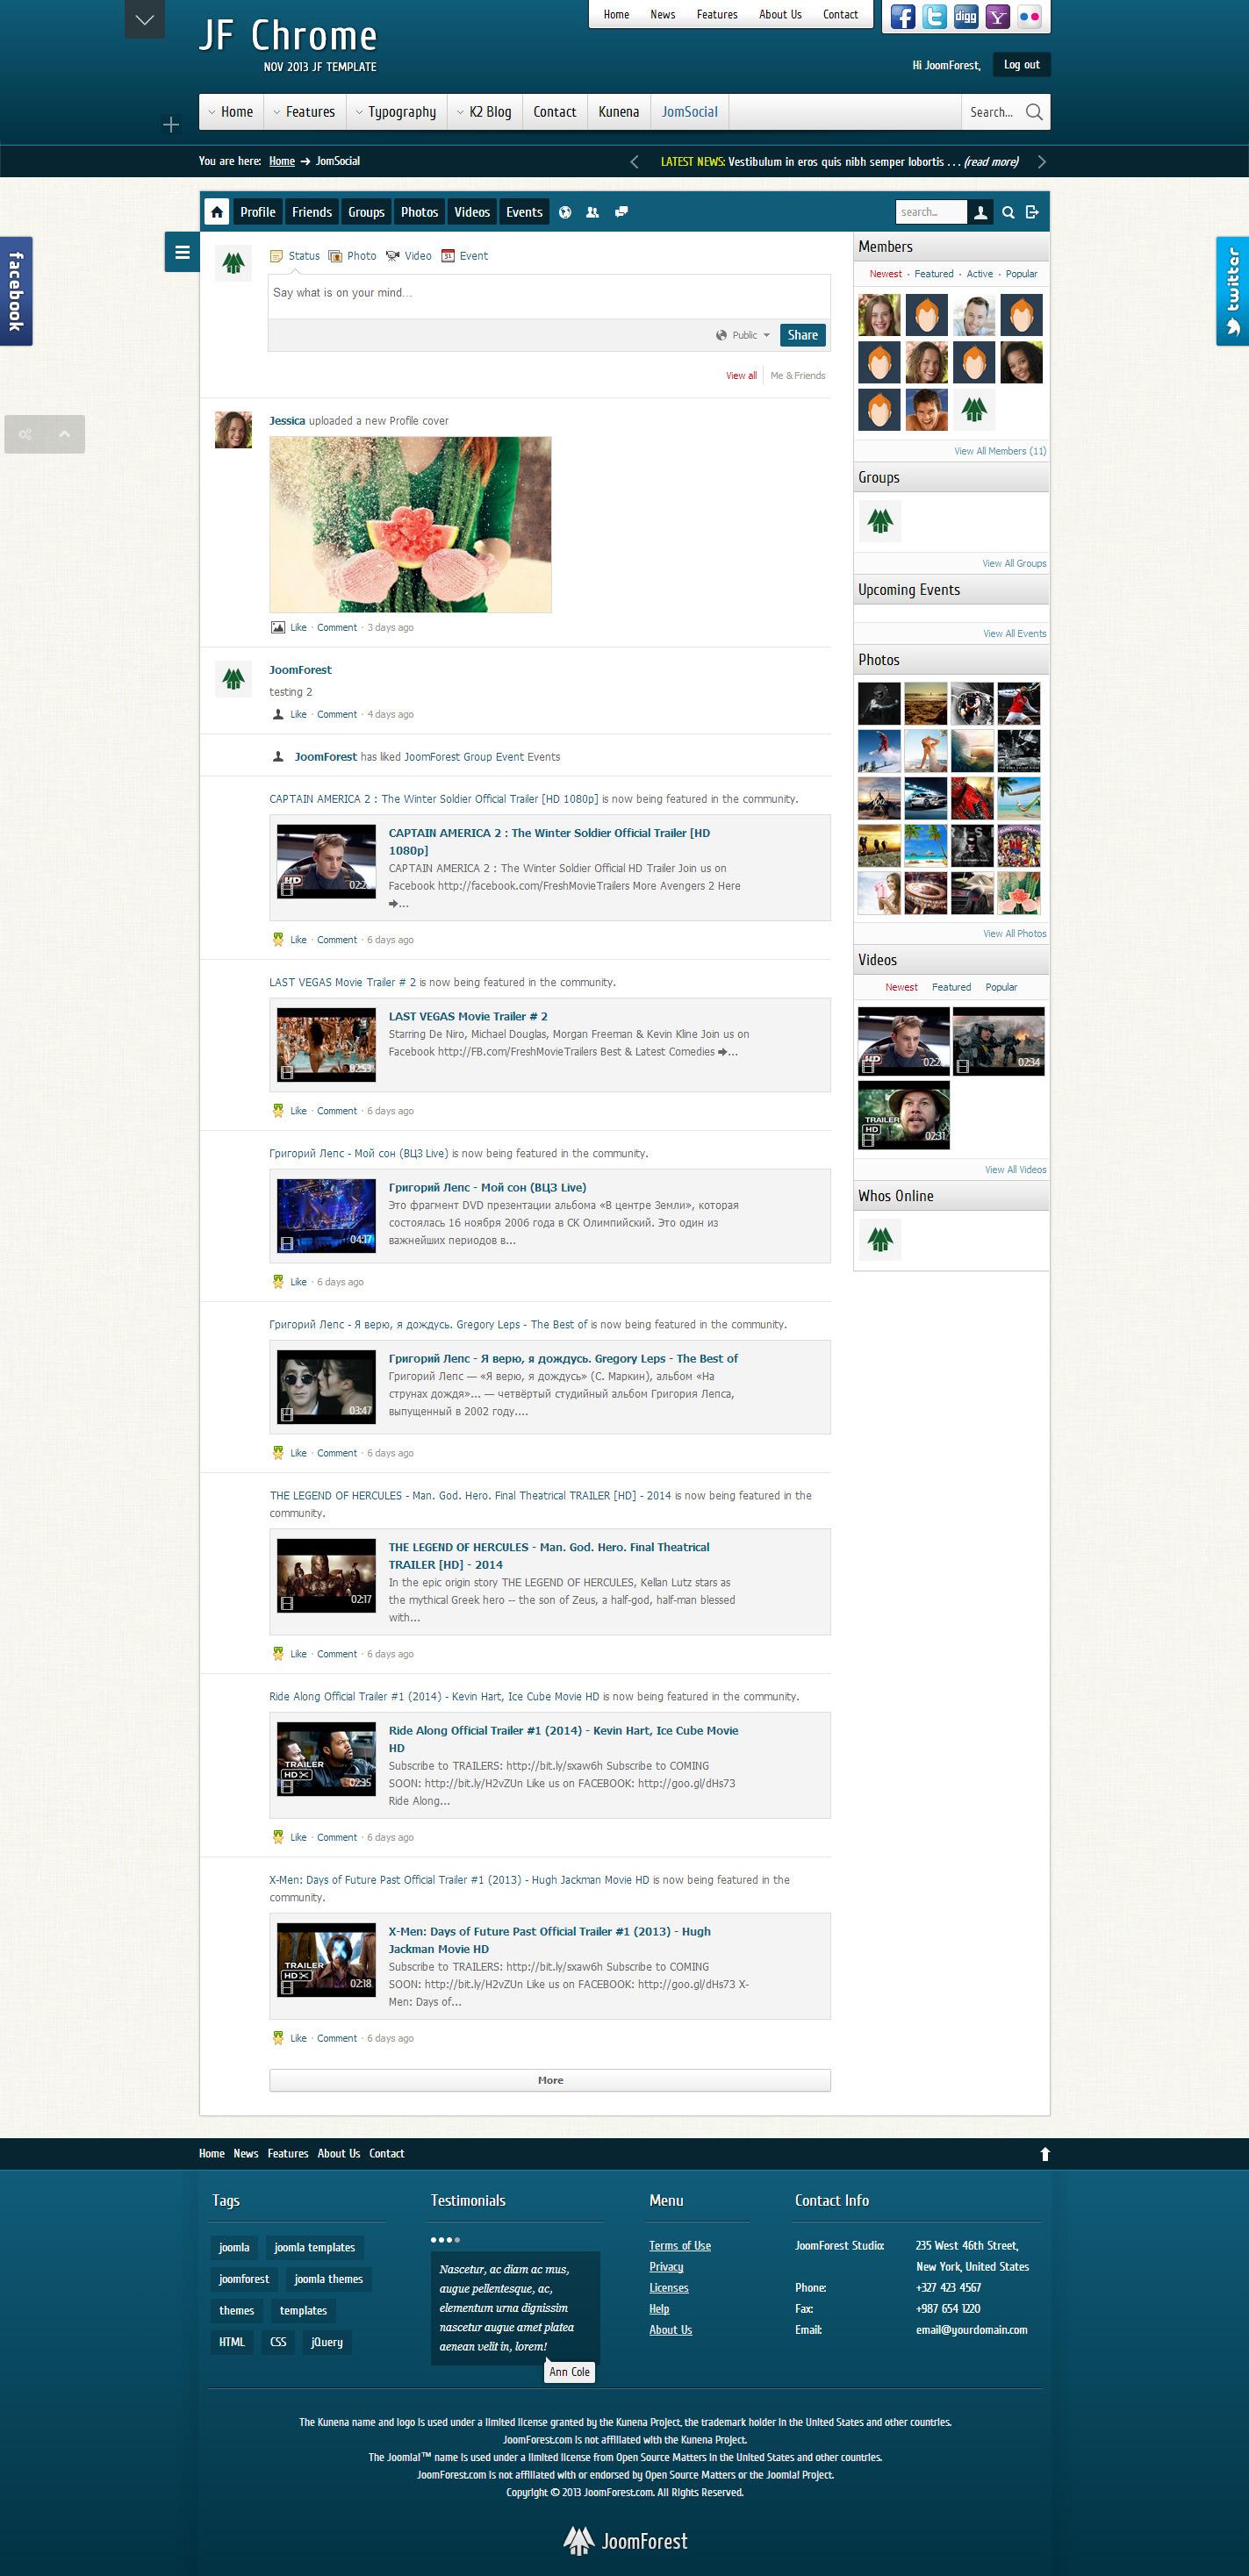 JF Chrome - Joomla Kunena JomSocial Template - JF Chrome - JomSocial FrontPage